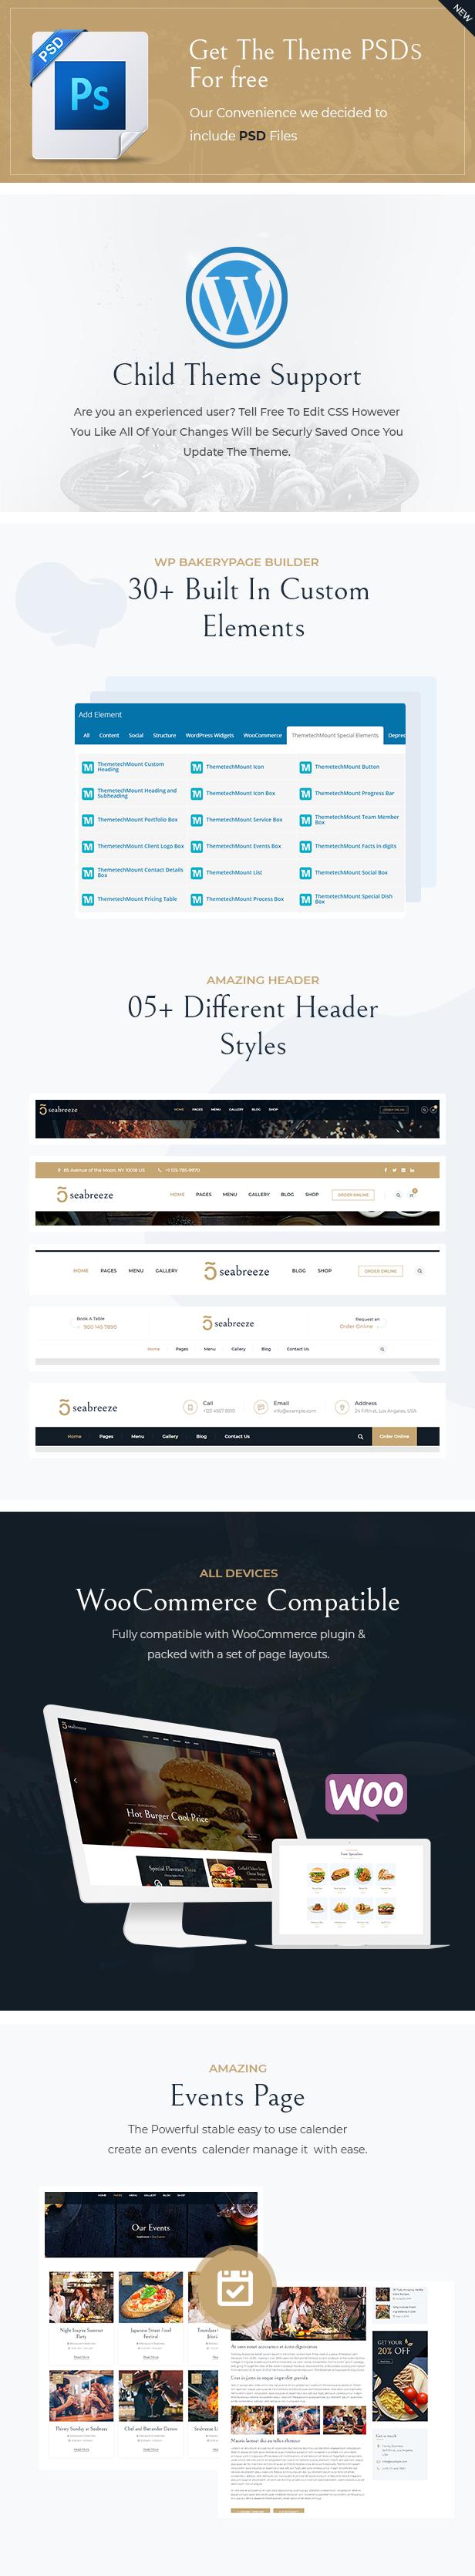 SeaBreeze WordPress Theme